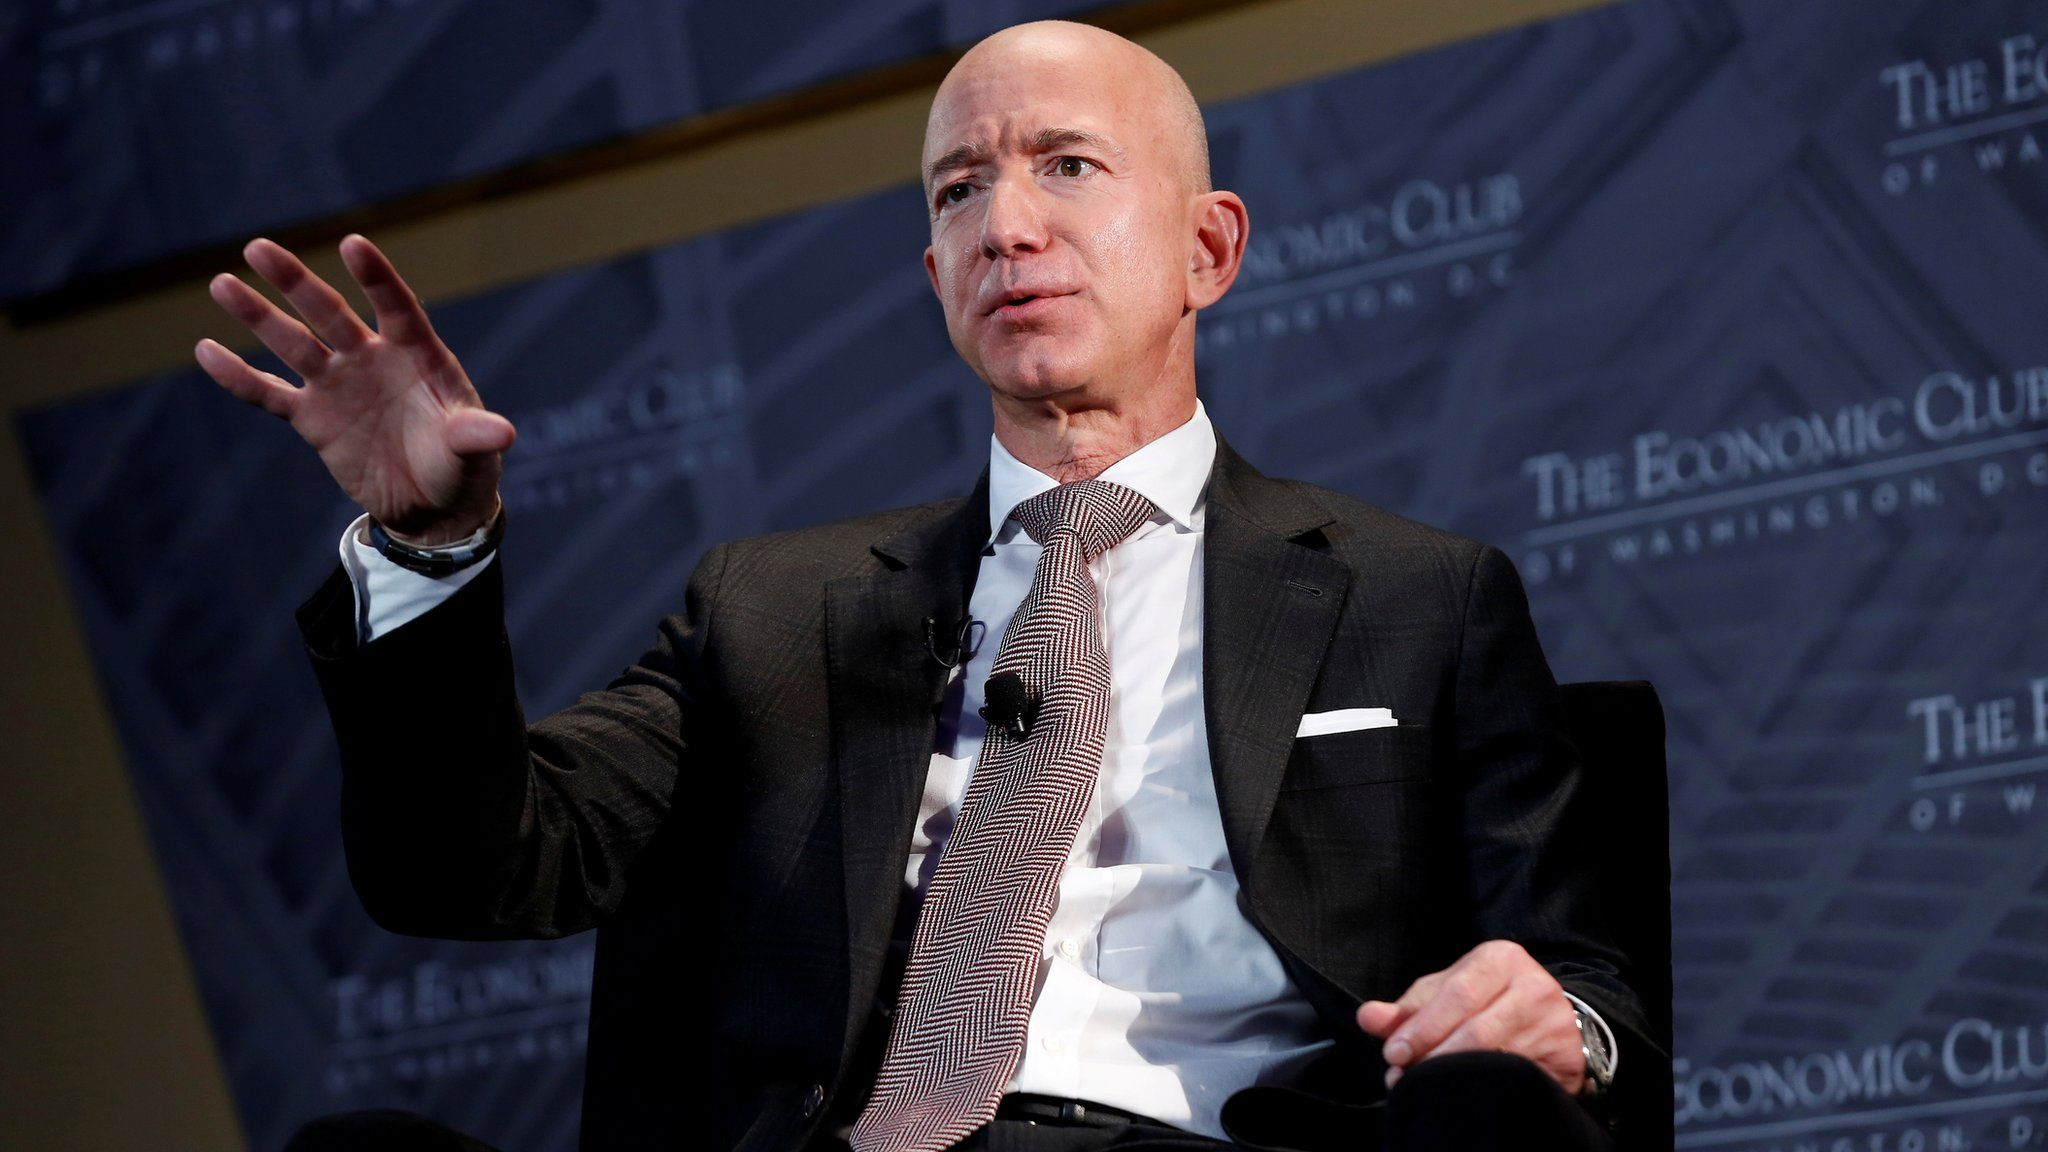 Jeff Bezos steps down as Amazon's Chief Executive